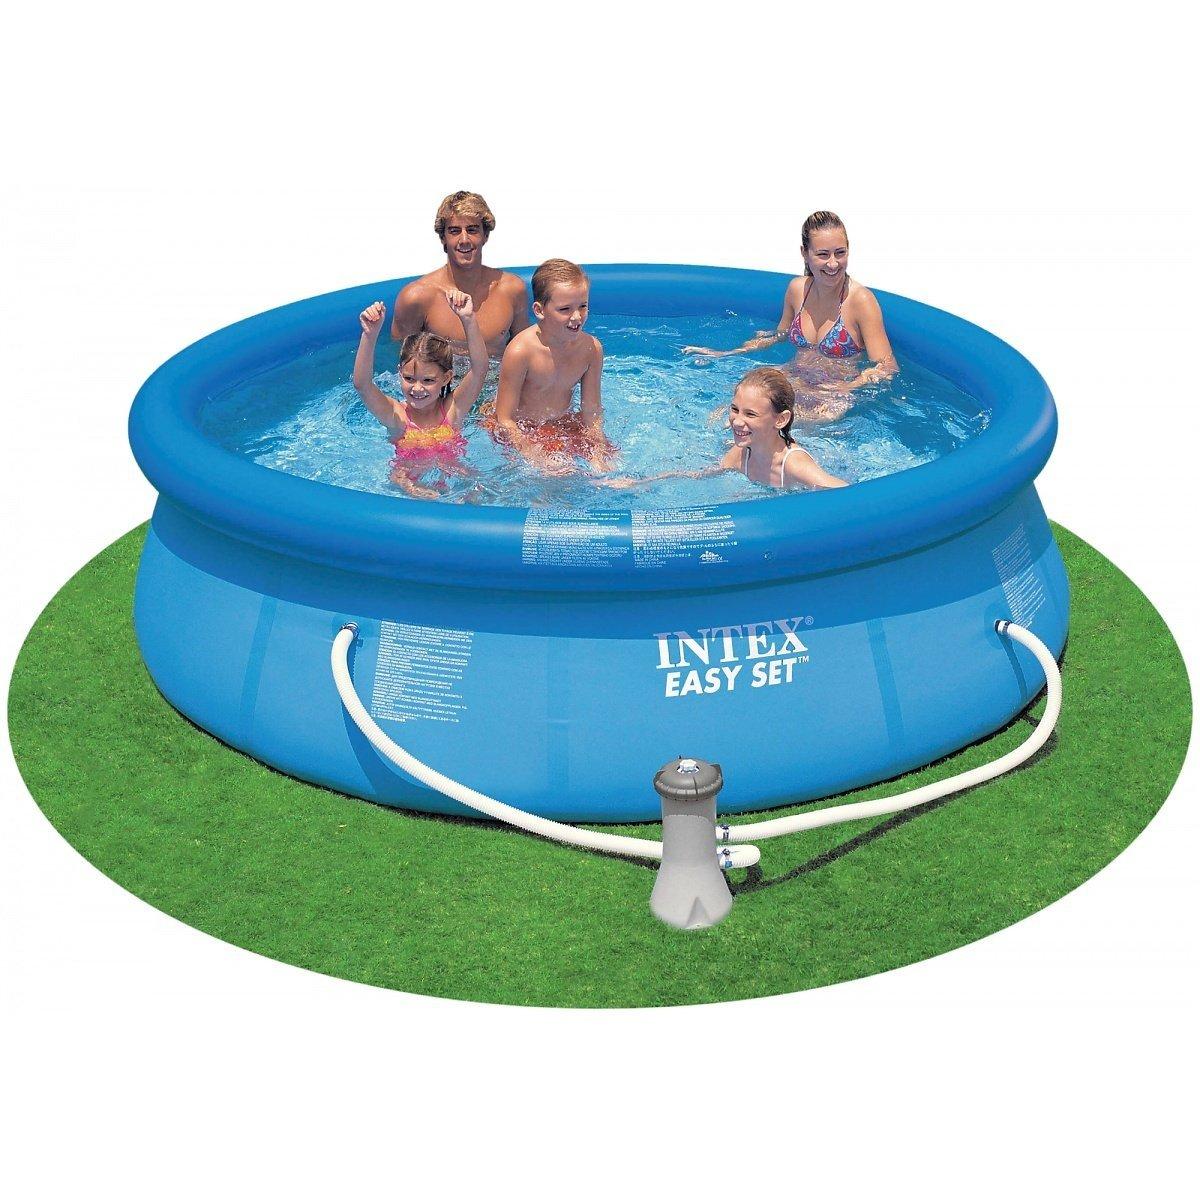 "Intex 10' x 30"" Easy Set Swimming Pool & 330 GPH Filter Pump | 28121EH"